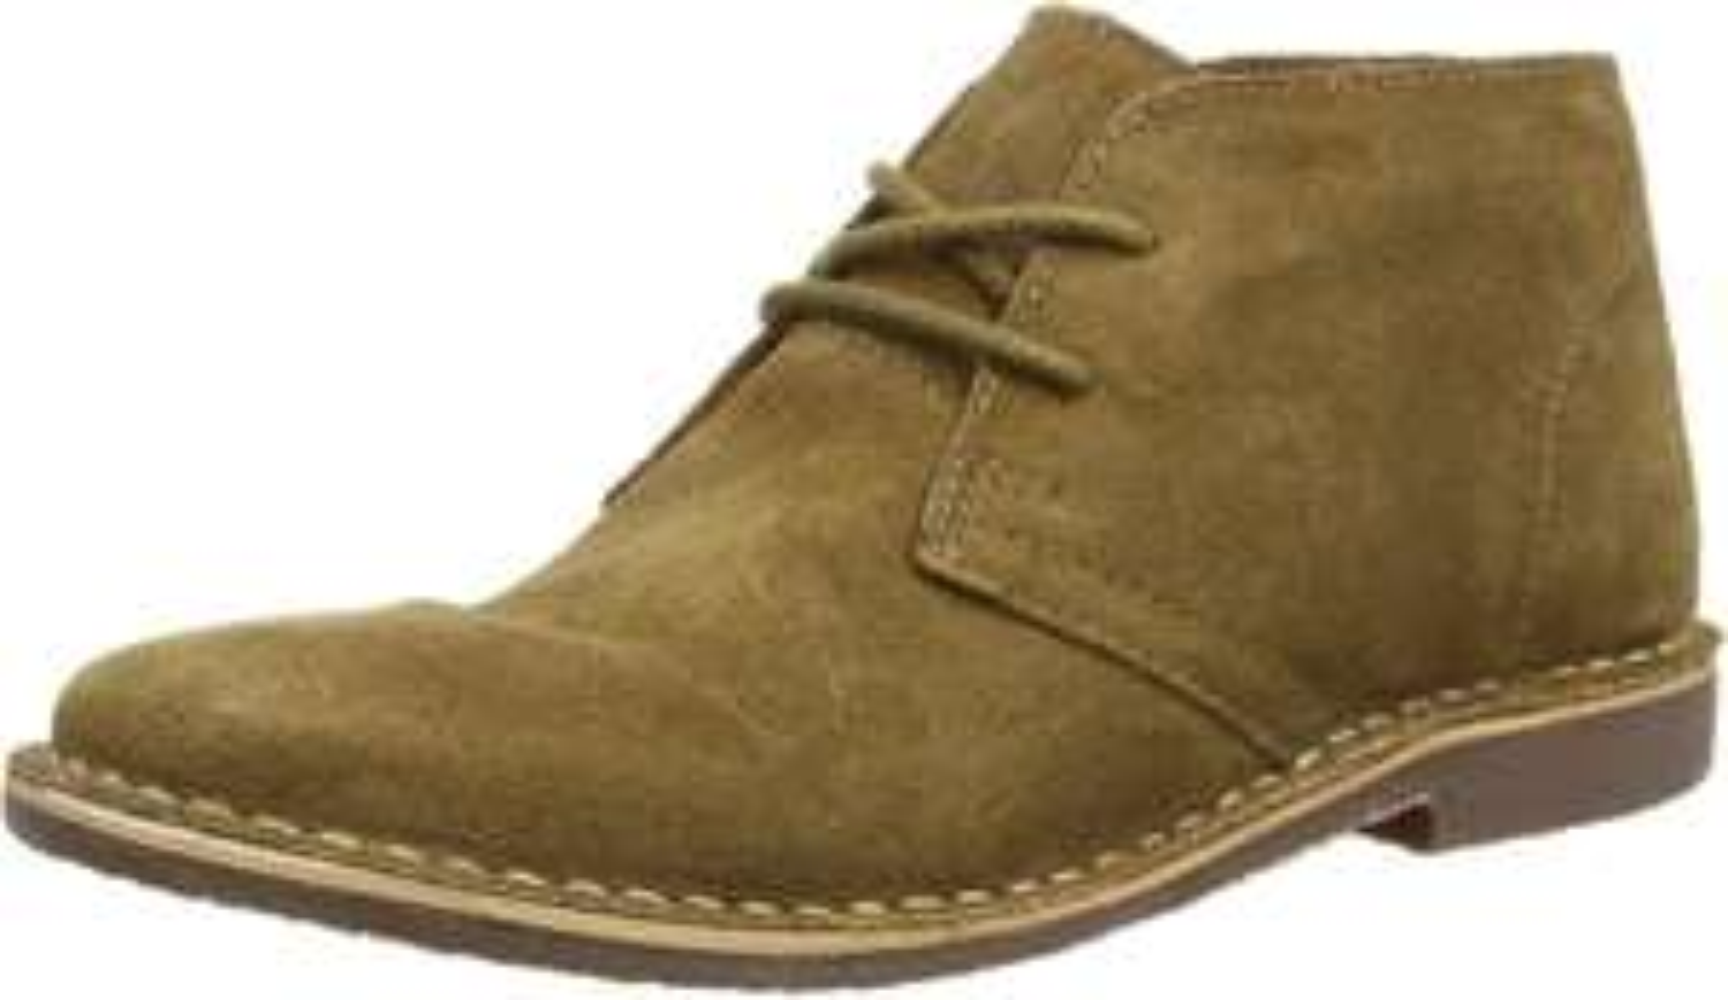 Red Tape Gobi Beige Suede Men's Desert Boots £19 (Prime) / £23.49 (non Prime) @ Amazon (£17.10 with Student Prime)